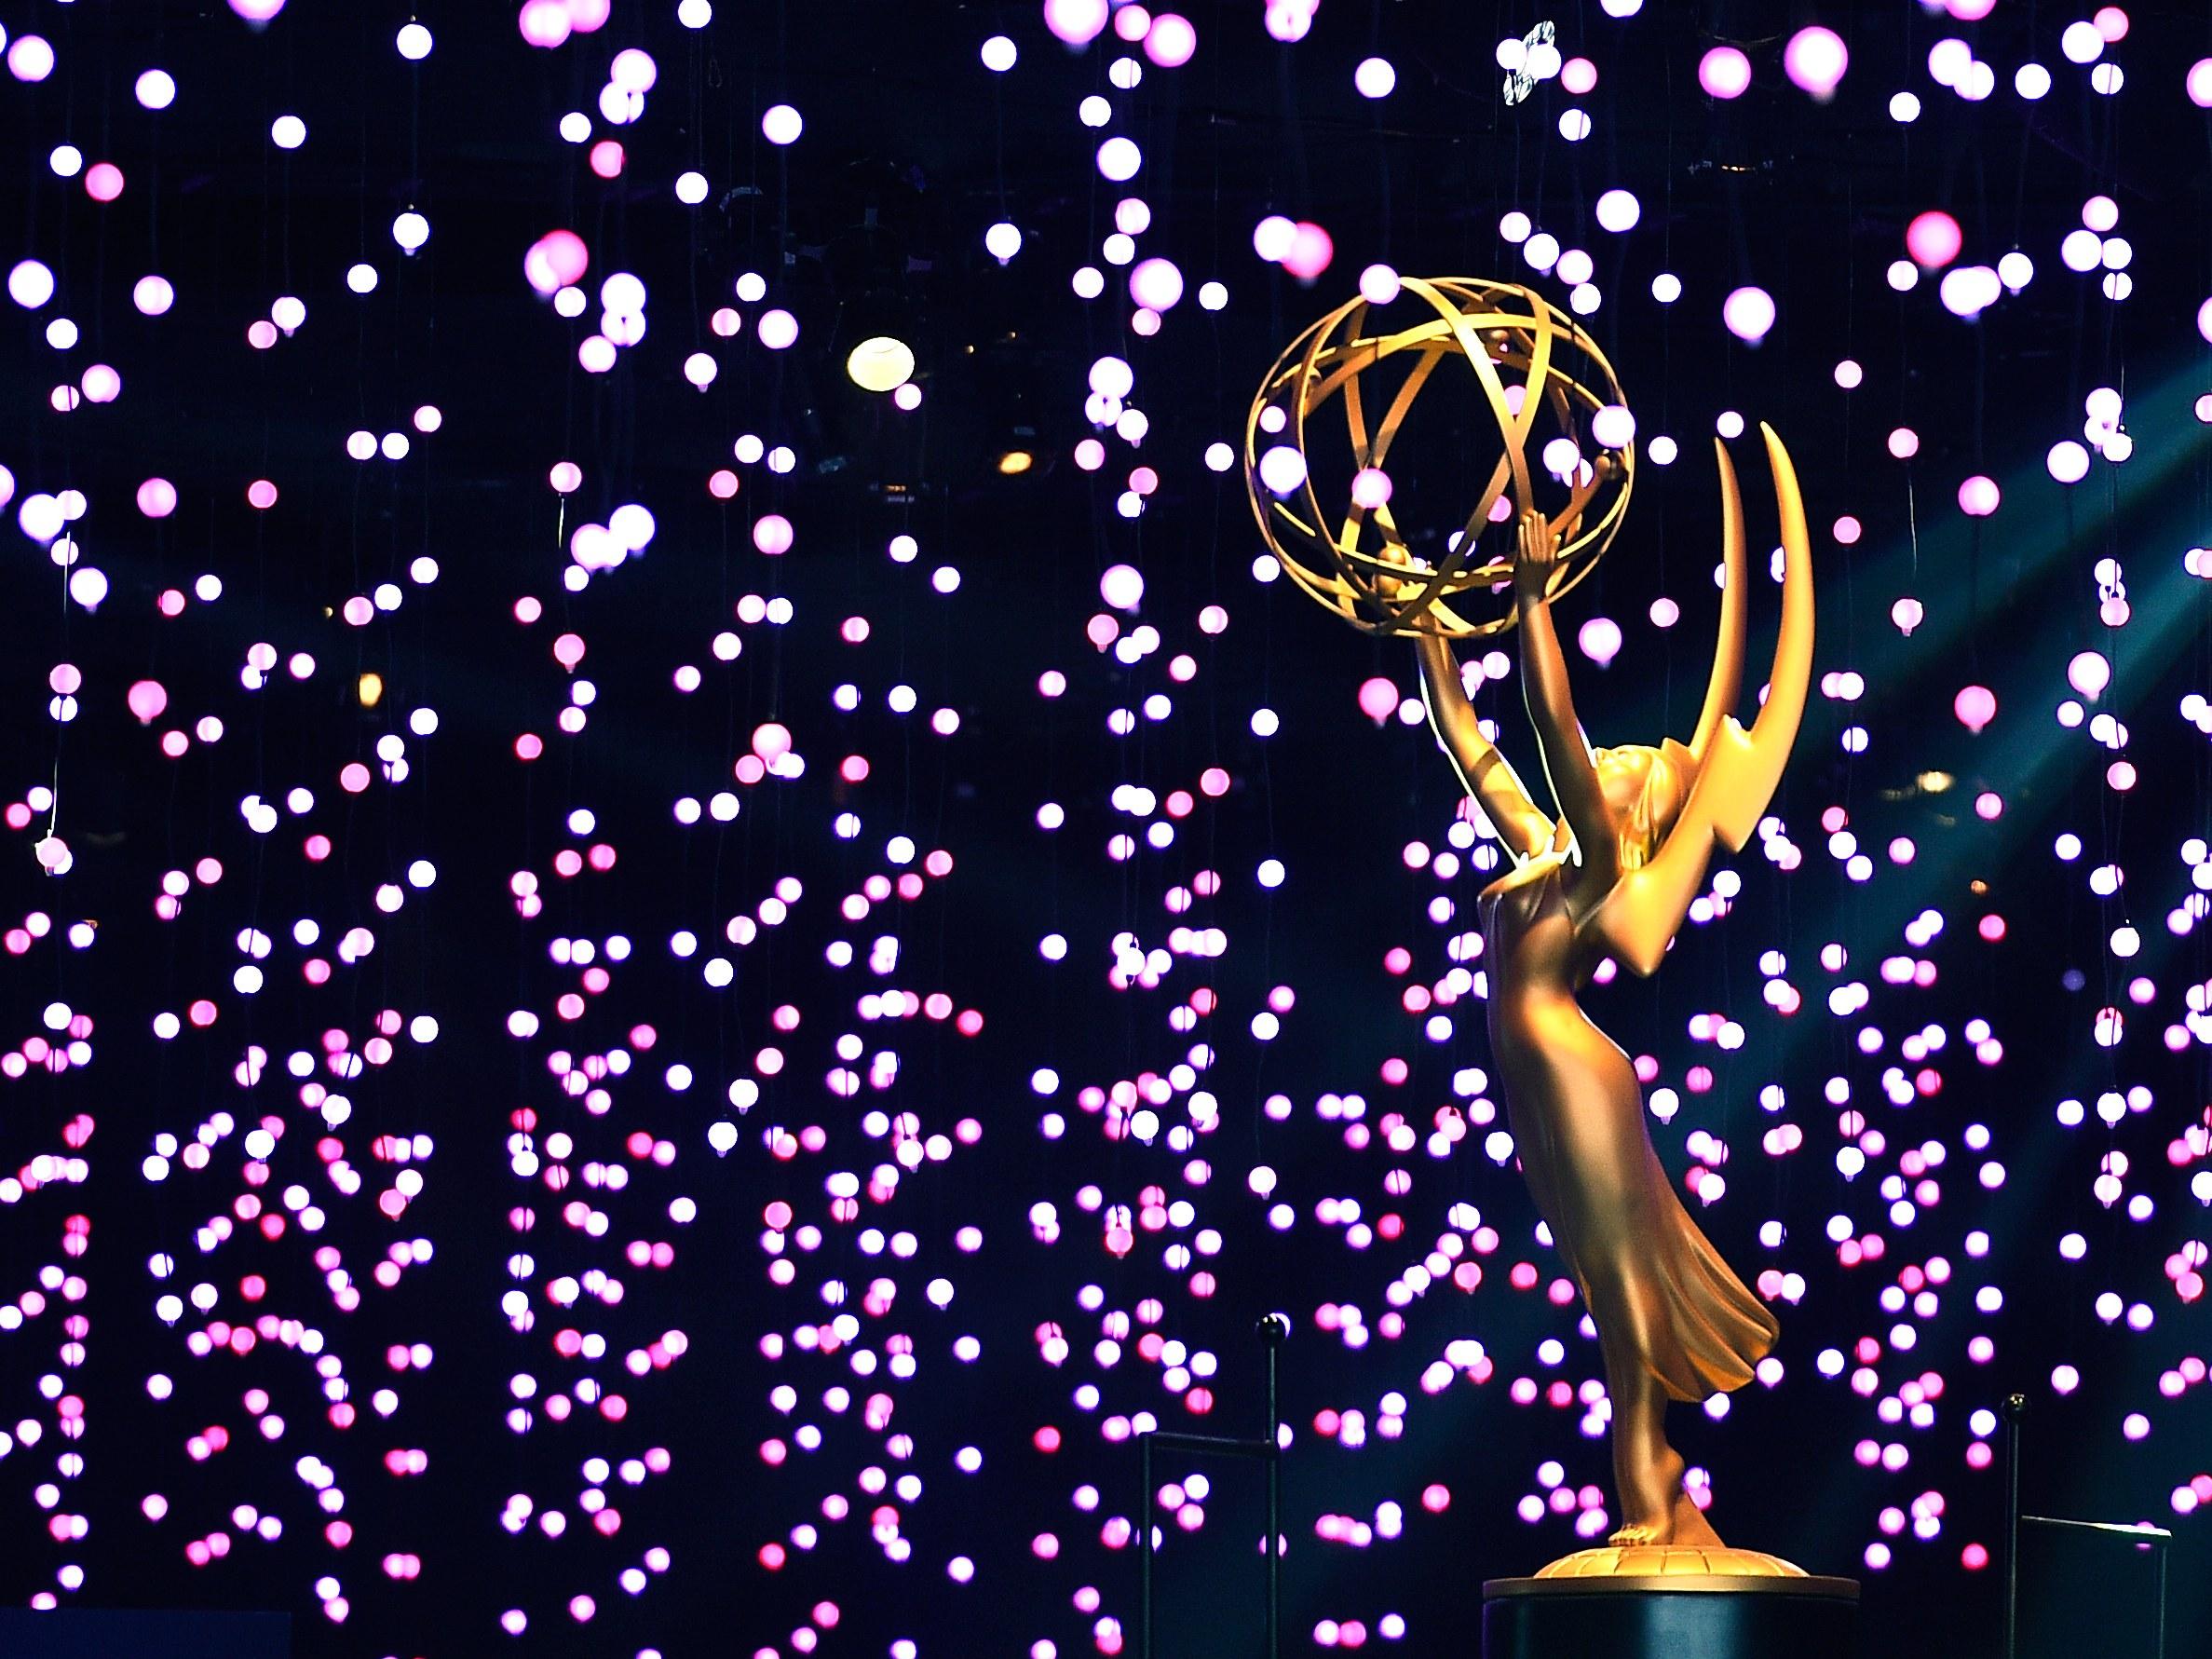 Zhvillohet ndarja e 70 e çmimeve Emmy